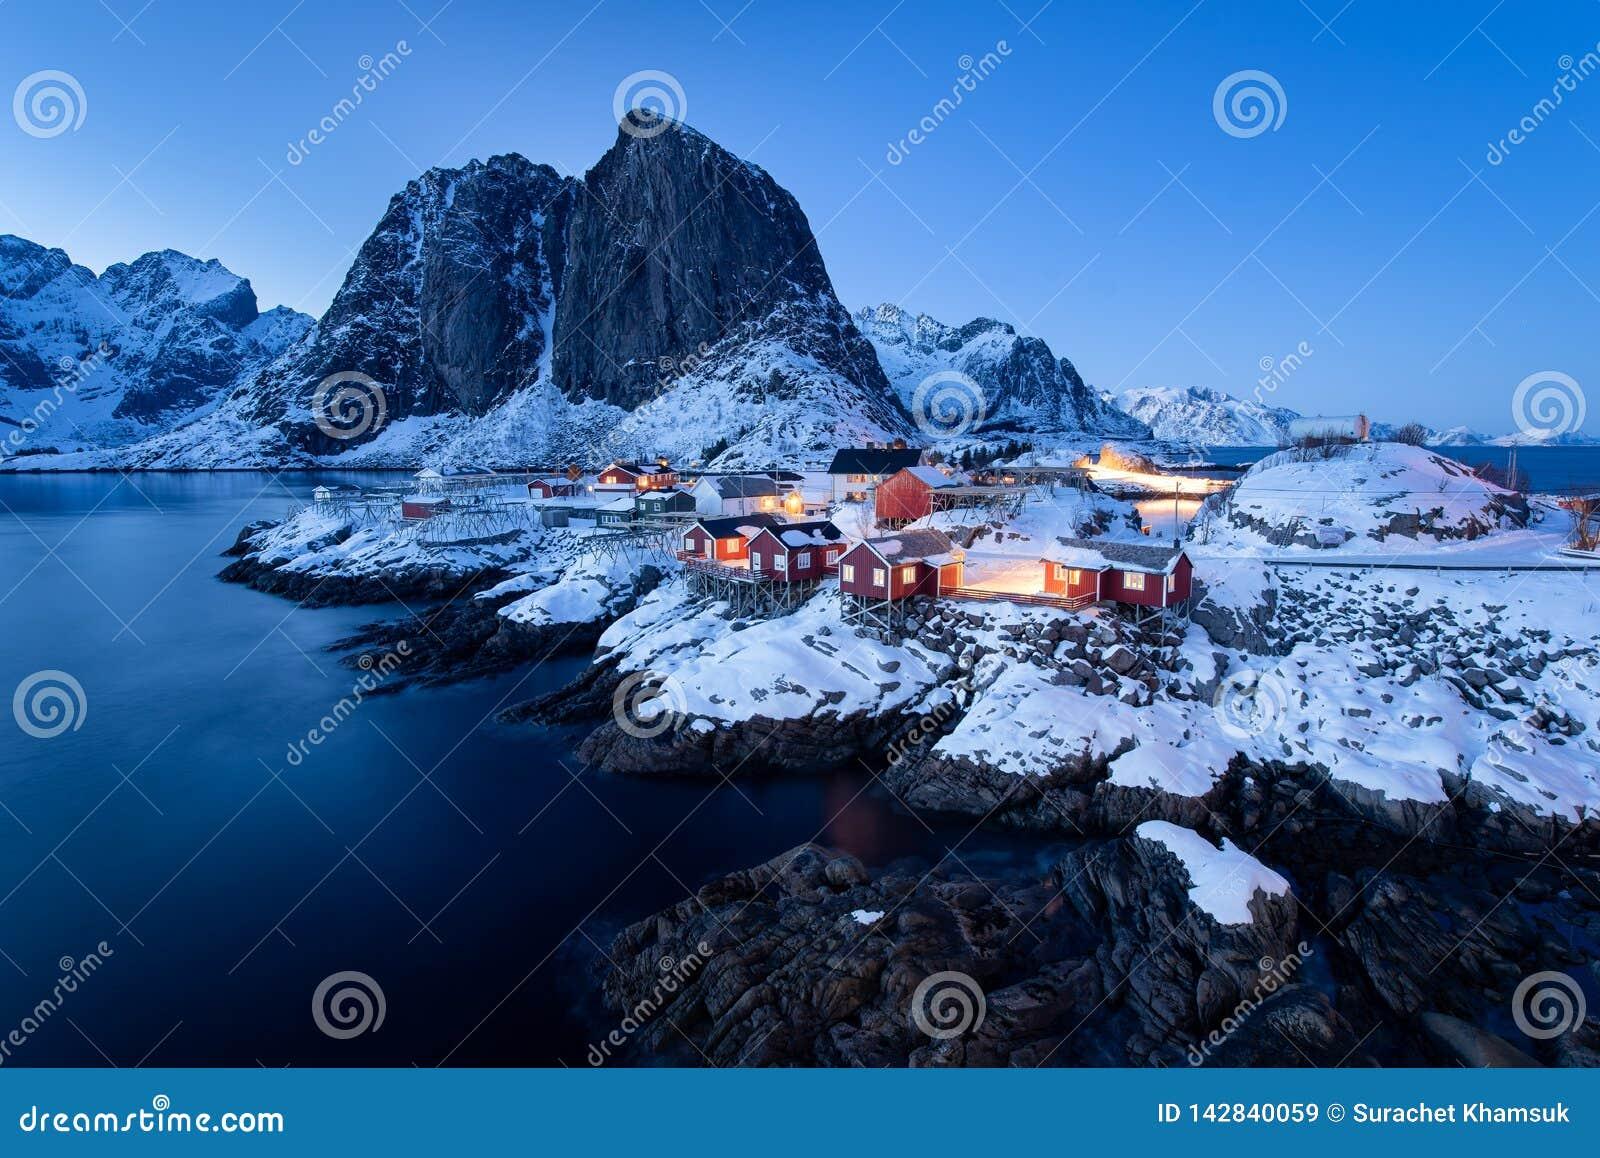 Rorbu καμπινών Fishermen's στο χωριό Hamnoy στο λυκόφως στη χειμερινή εποχή, νησιά Lofoten, Νορβηγία